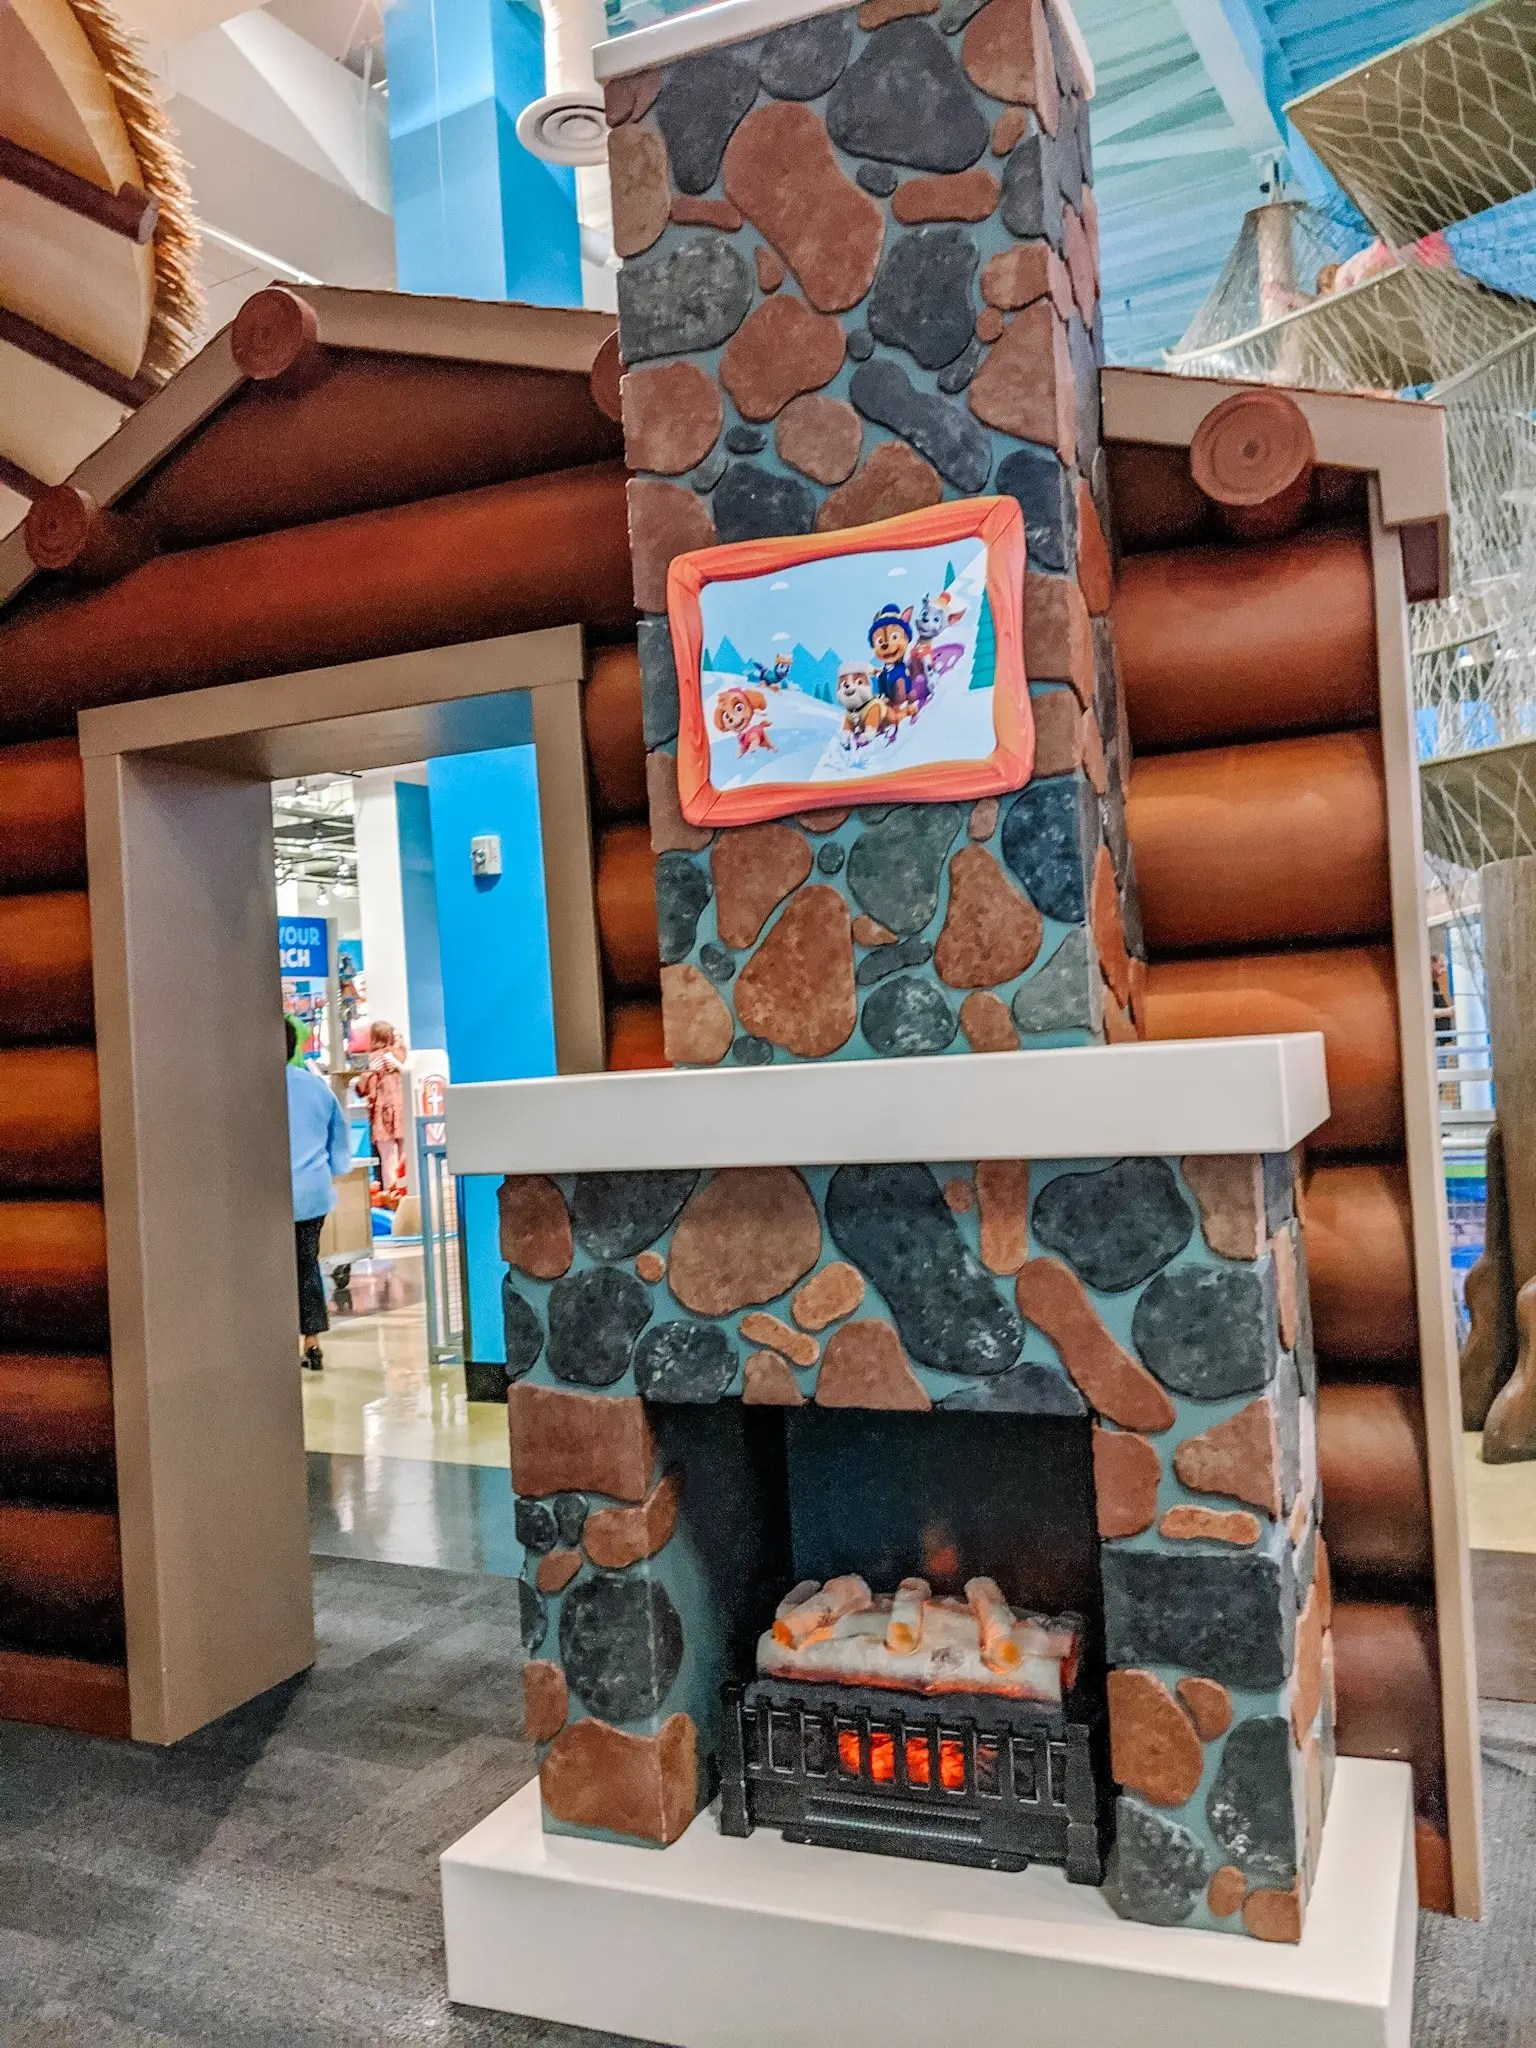 exhibit at the Glazer Children's Museum